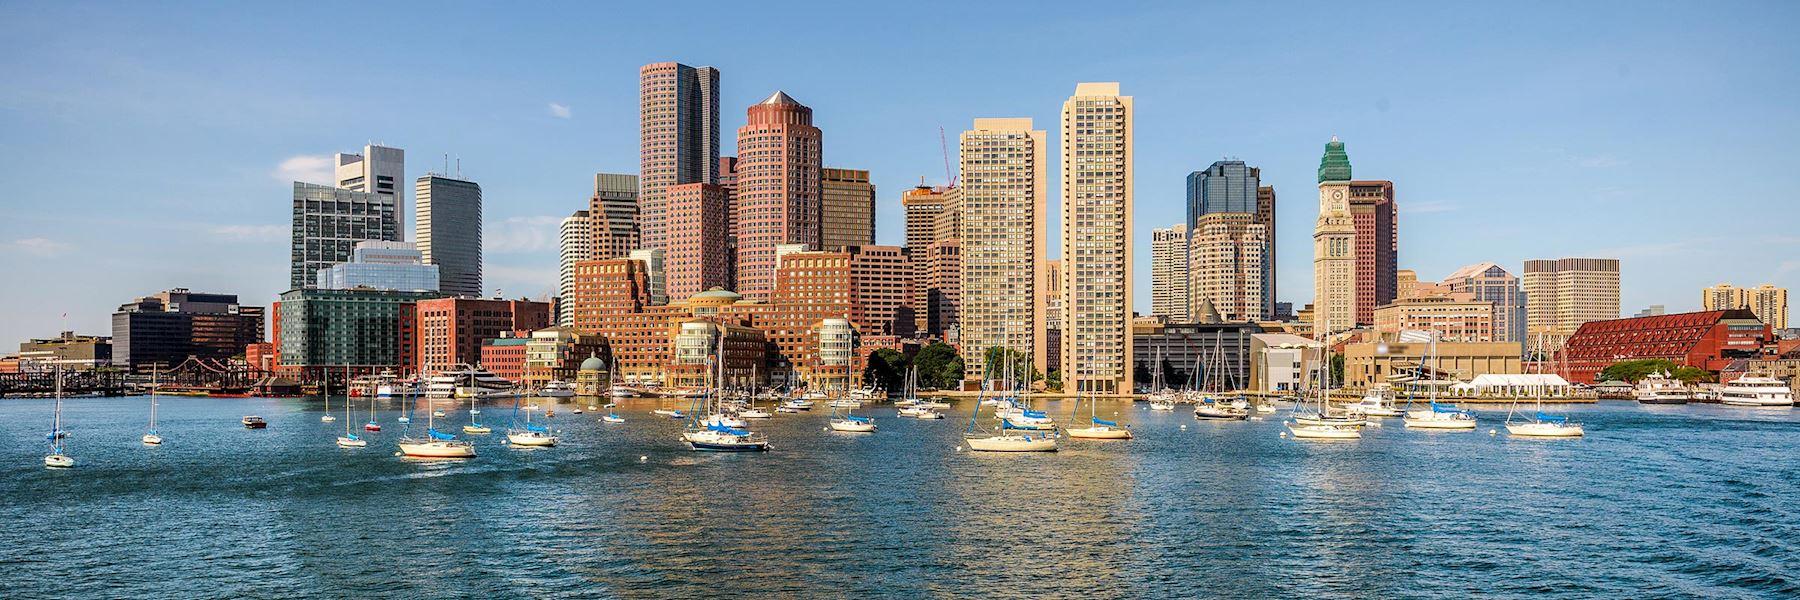 Visit Boston, New England